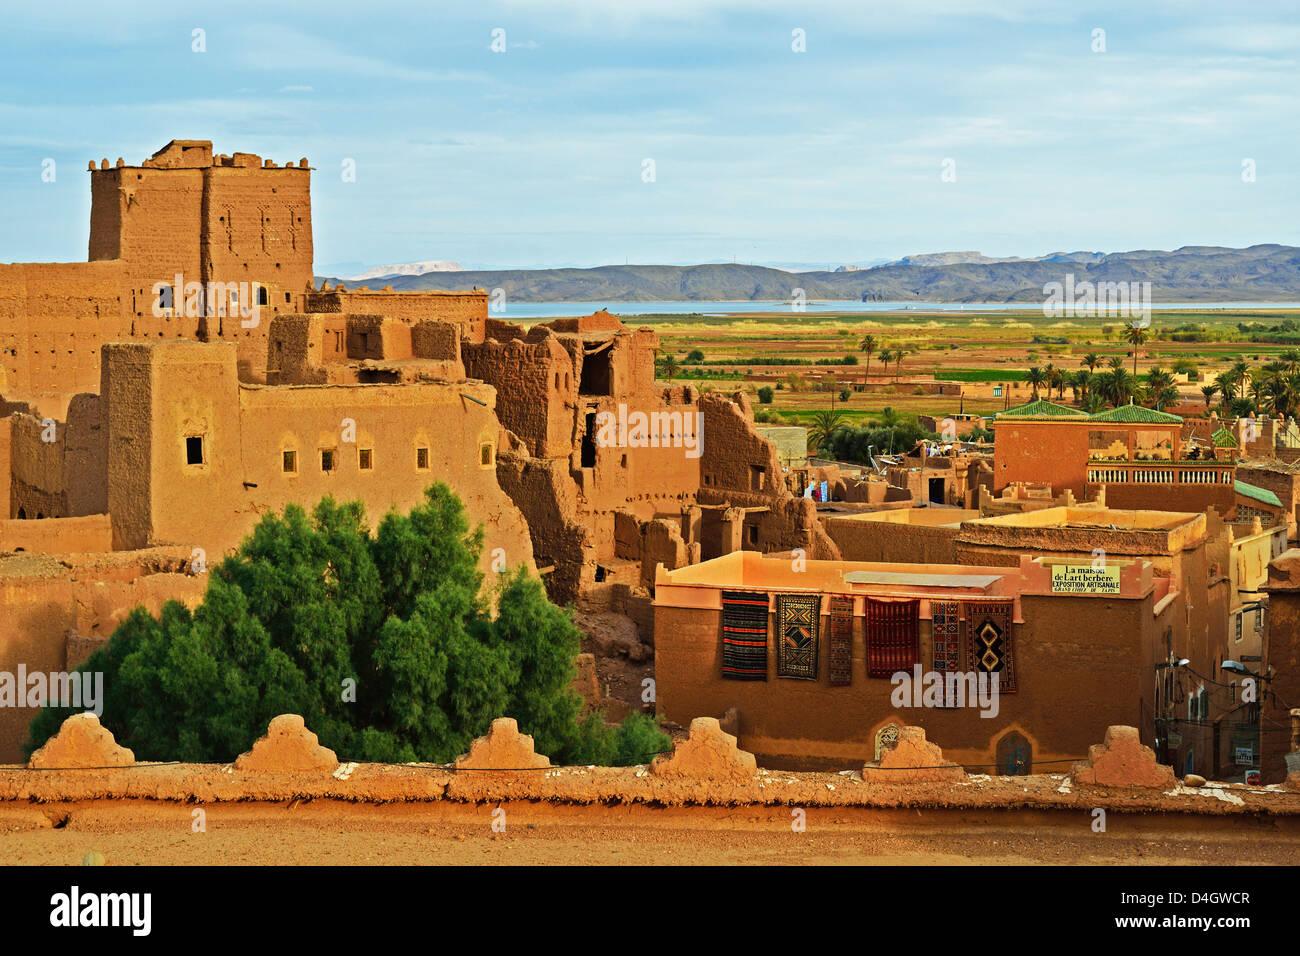 Kasbah Taourirt, Ouarzazate, Marokko, Nordafrika Stockbild